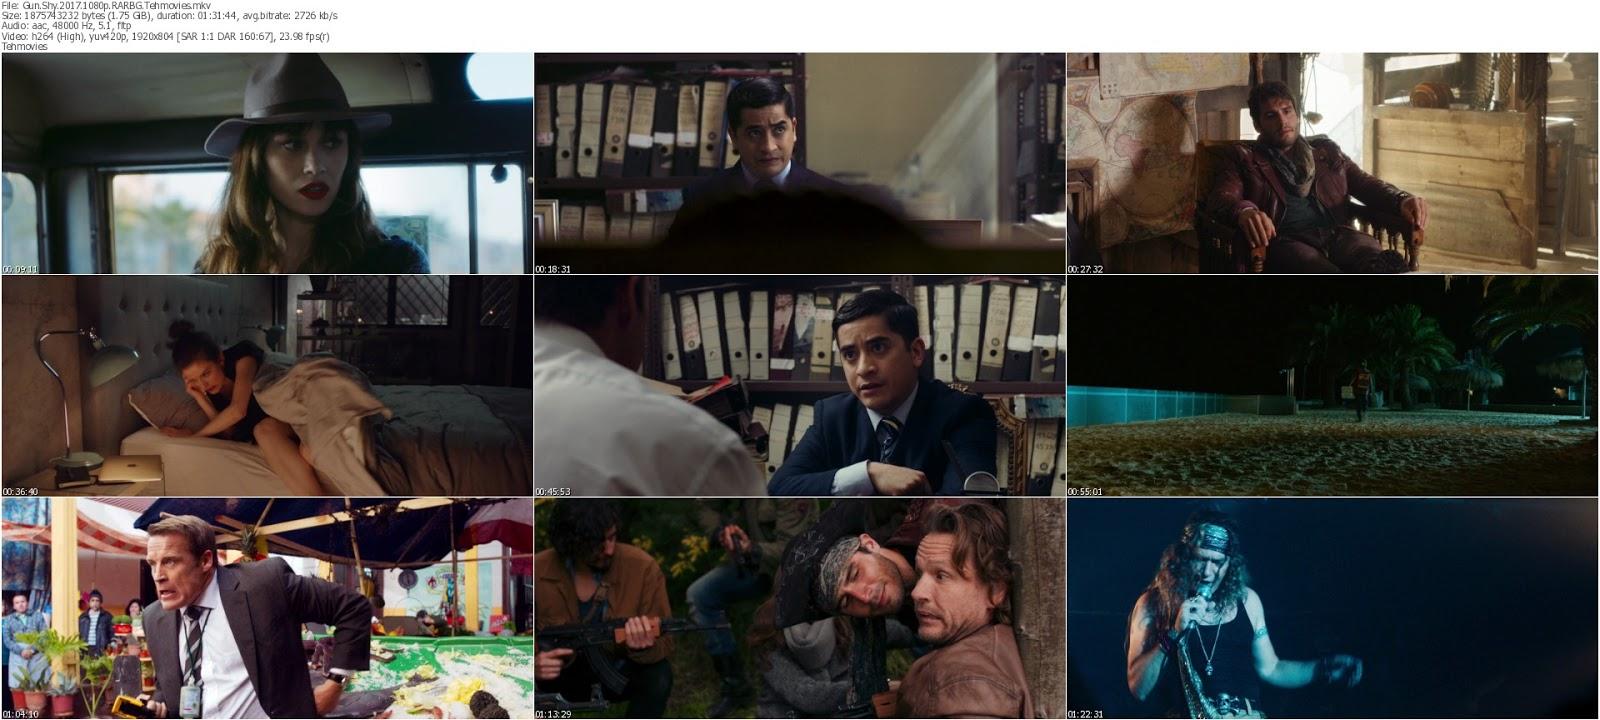 Gun Shy 2017 BluRay HD 1080p/720p-Direct Links